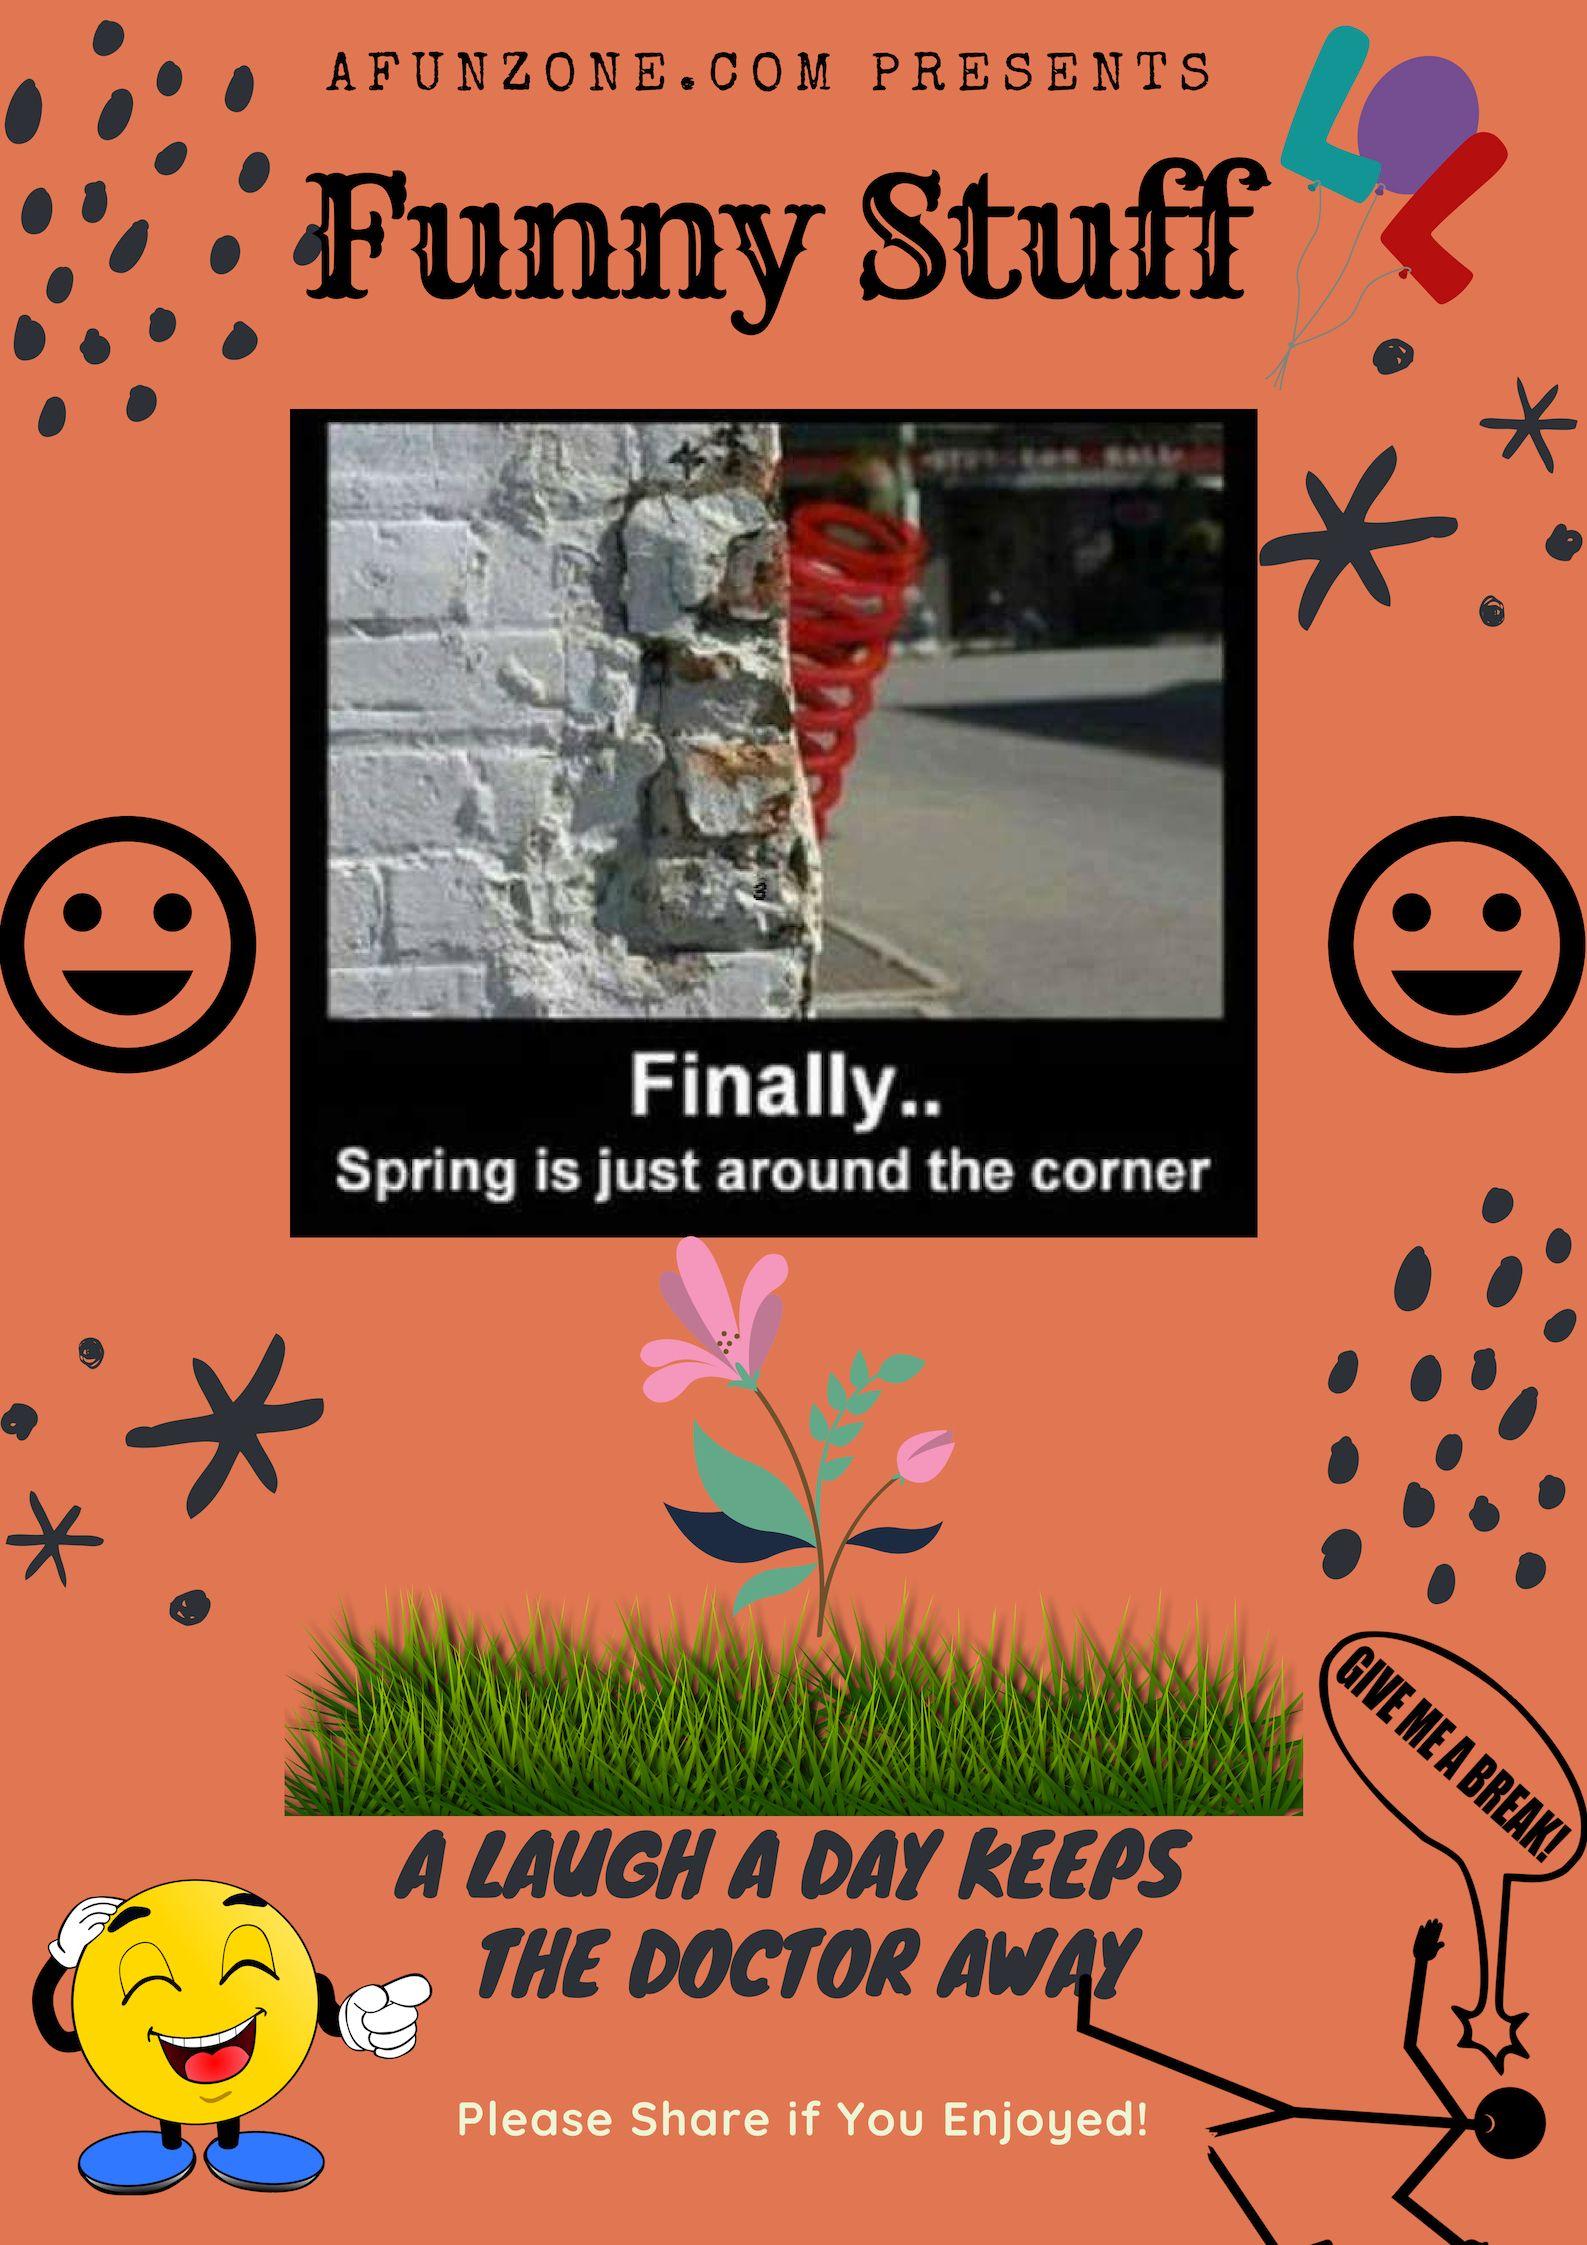 Today S Humor For 3 23 19 Humor Jokes Spring Time